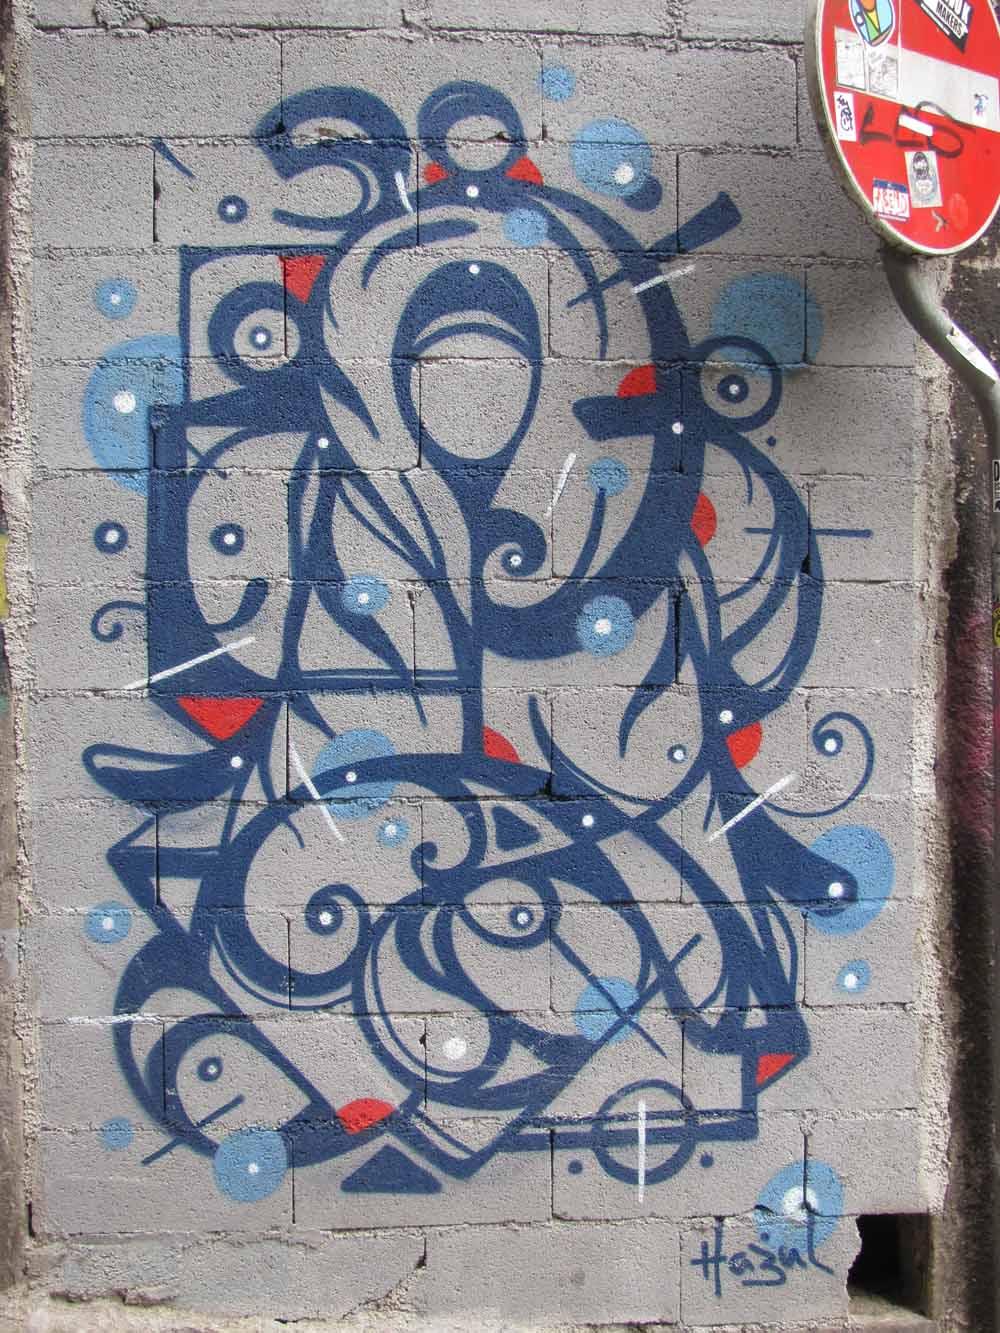 Street art from Porto23